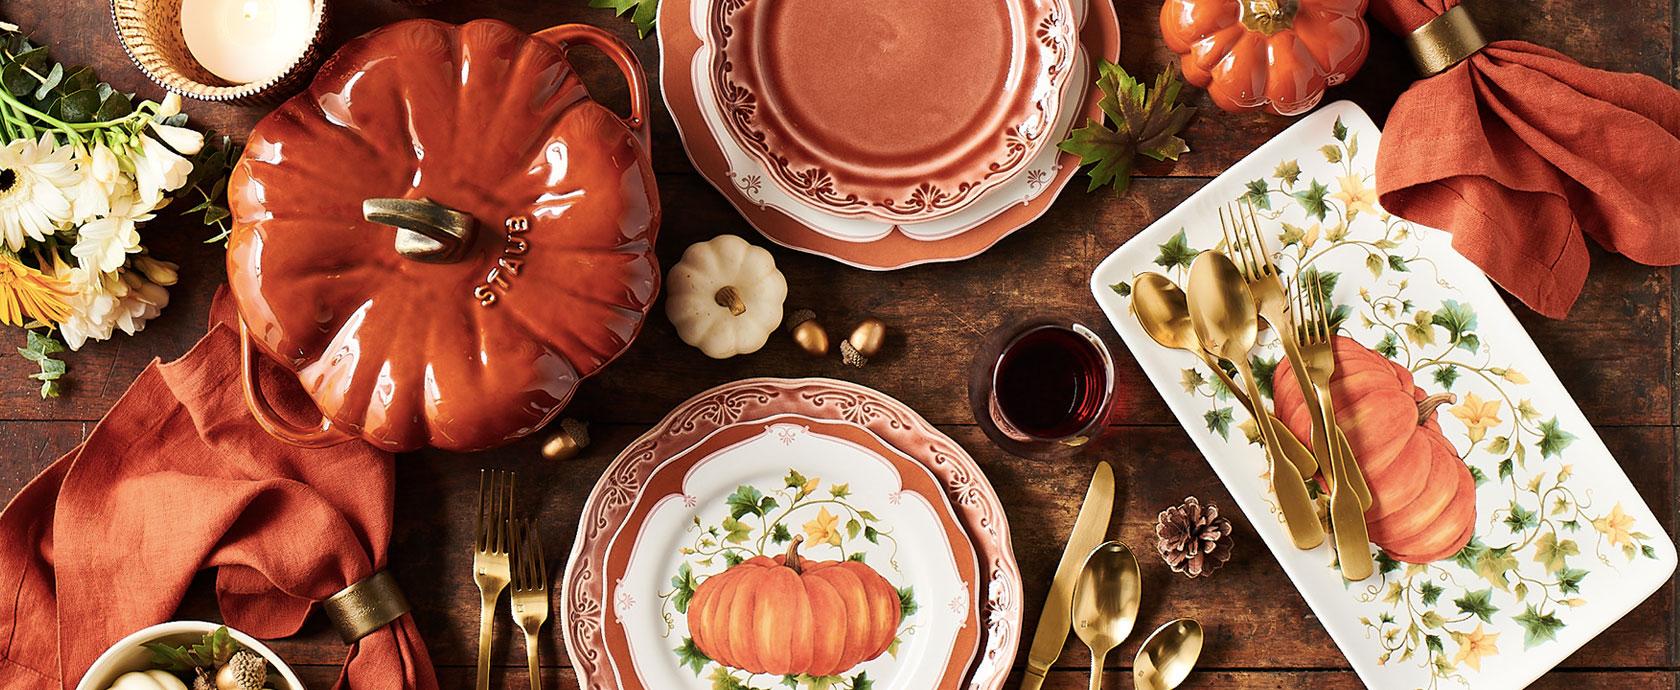 Staub pumpkin cocotte and pumpkin plates